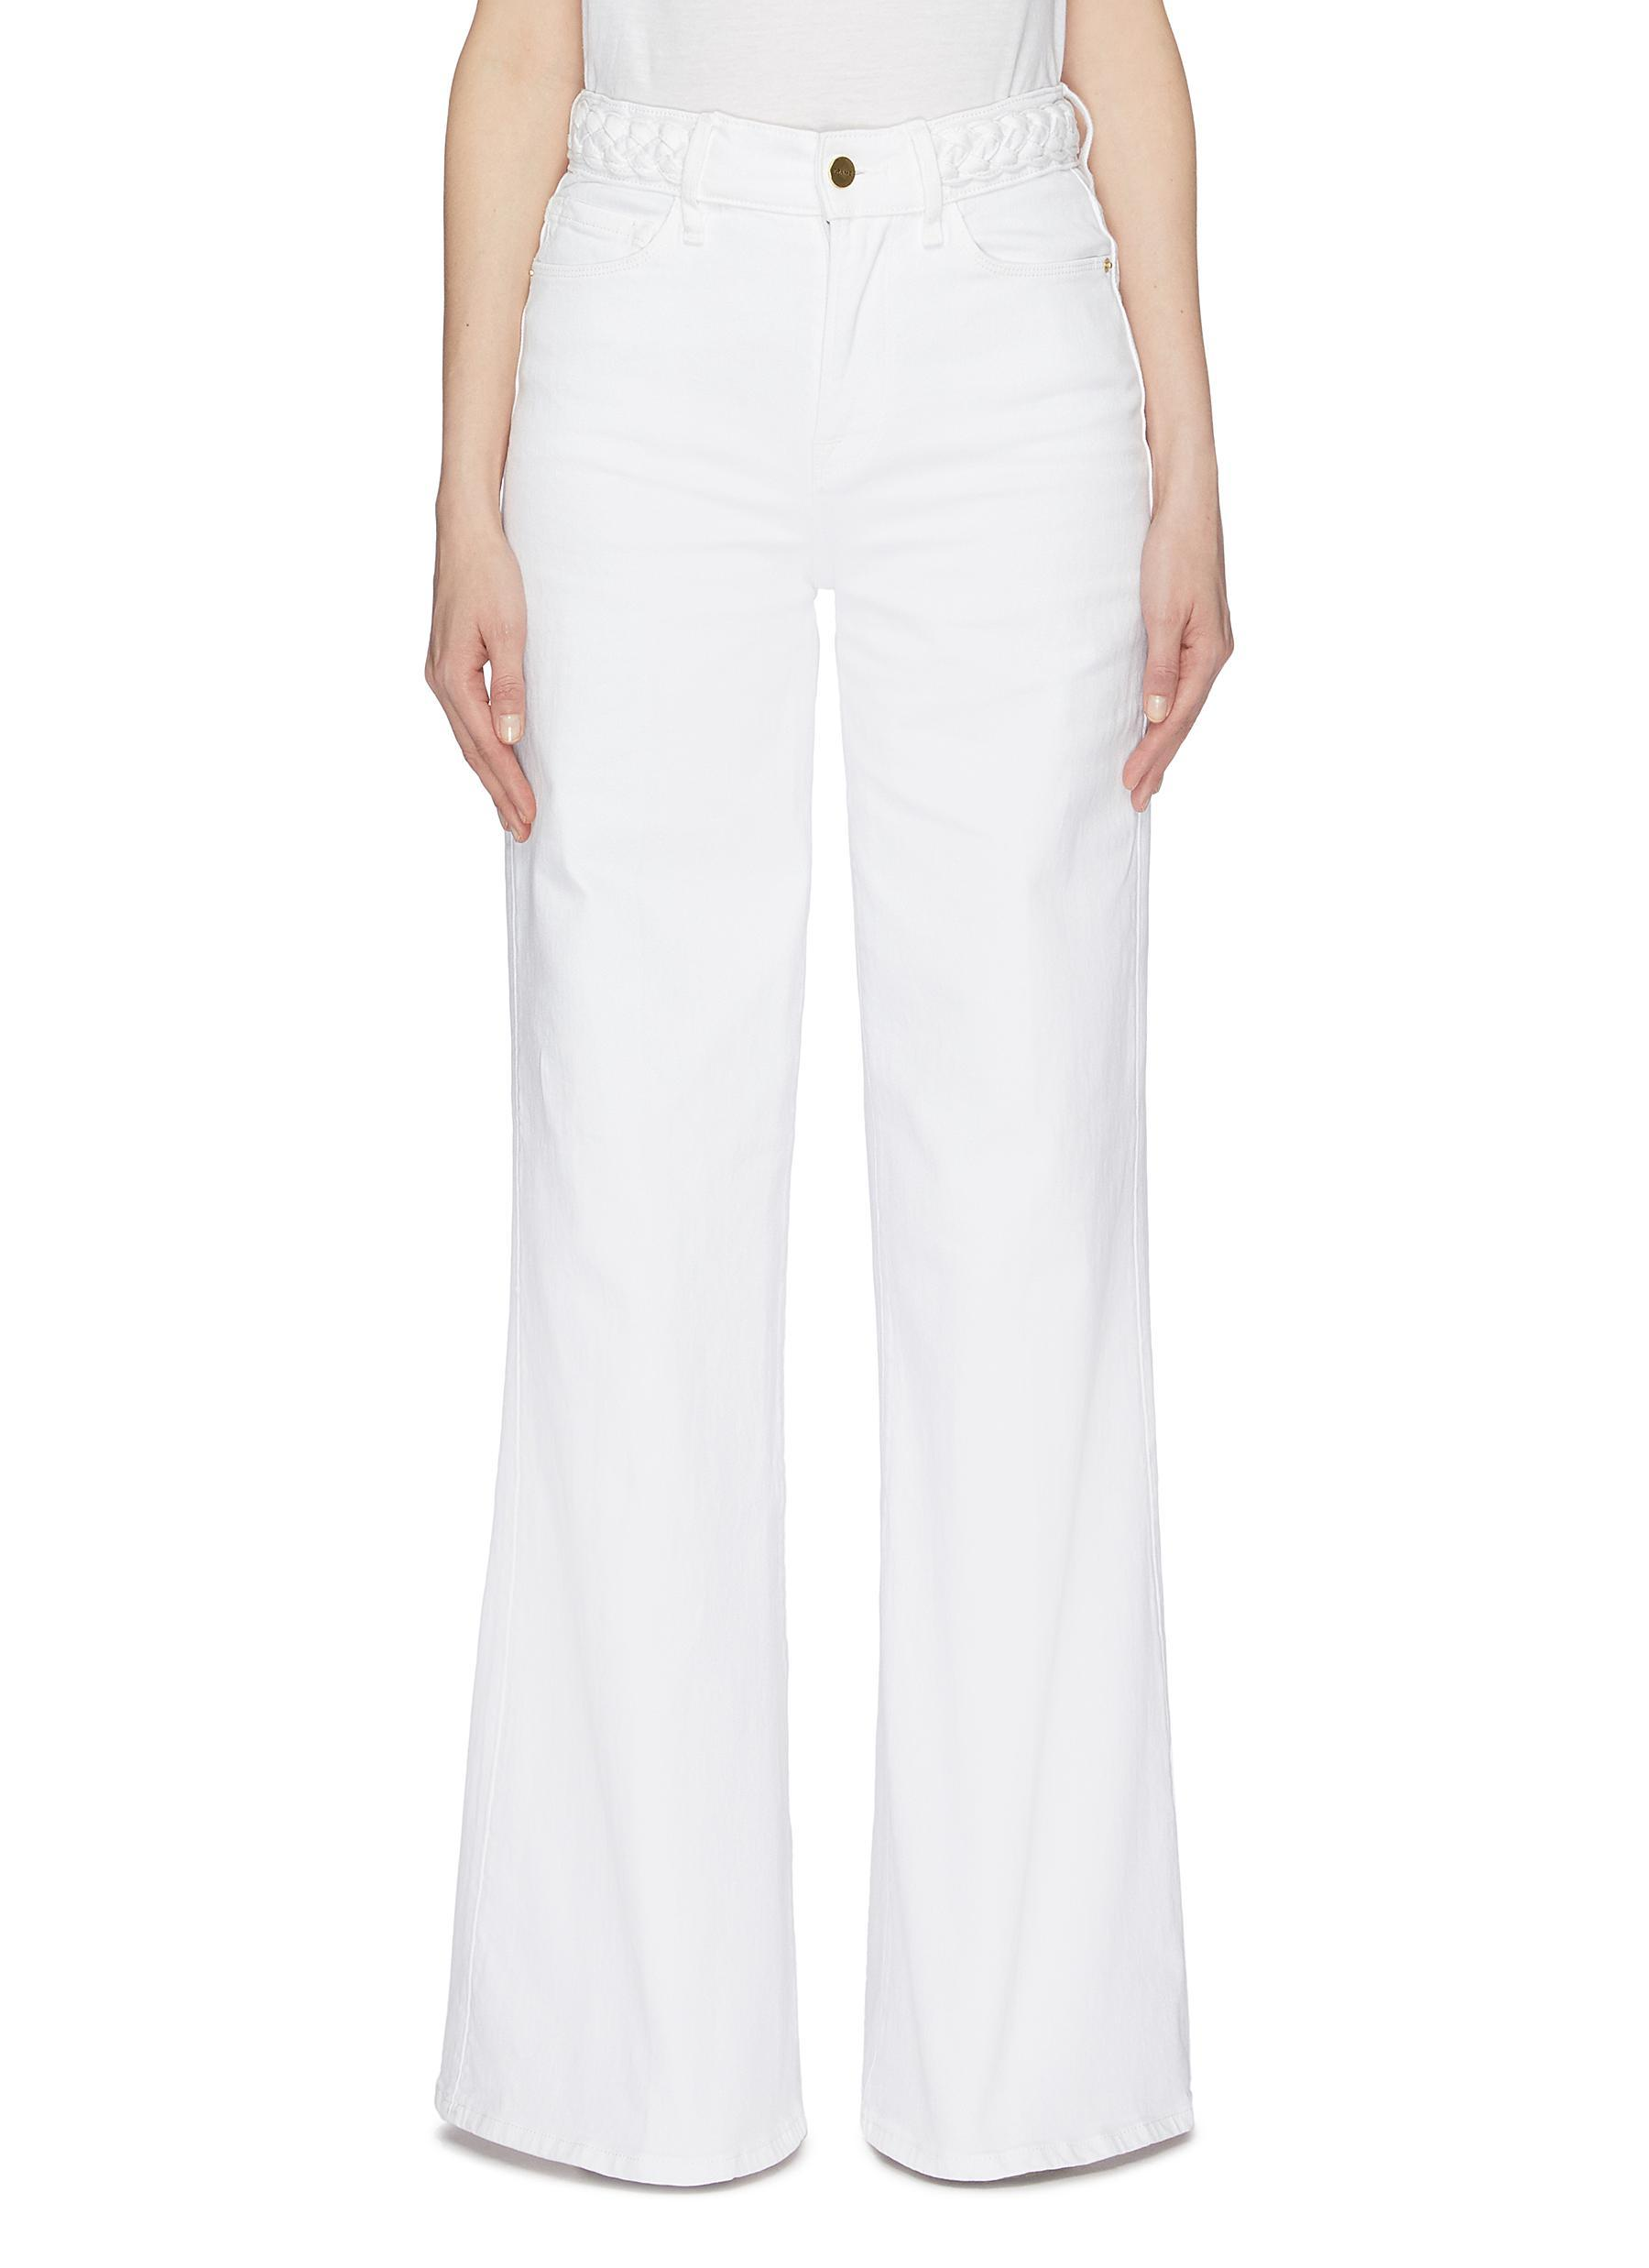 Frame Denim Le Palazzo Braid Waist Wide Leg Jeans Blanc NWT $275